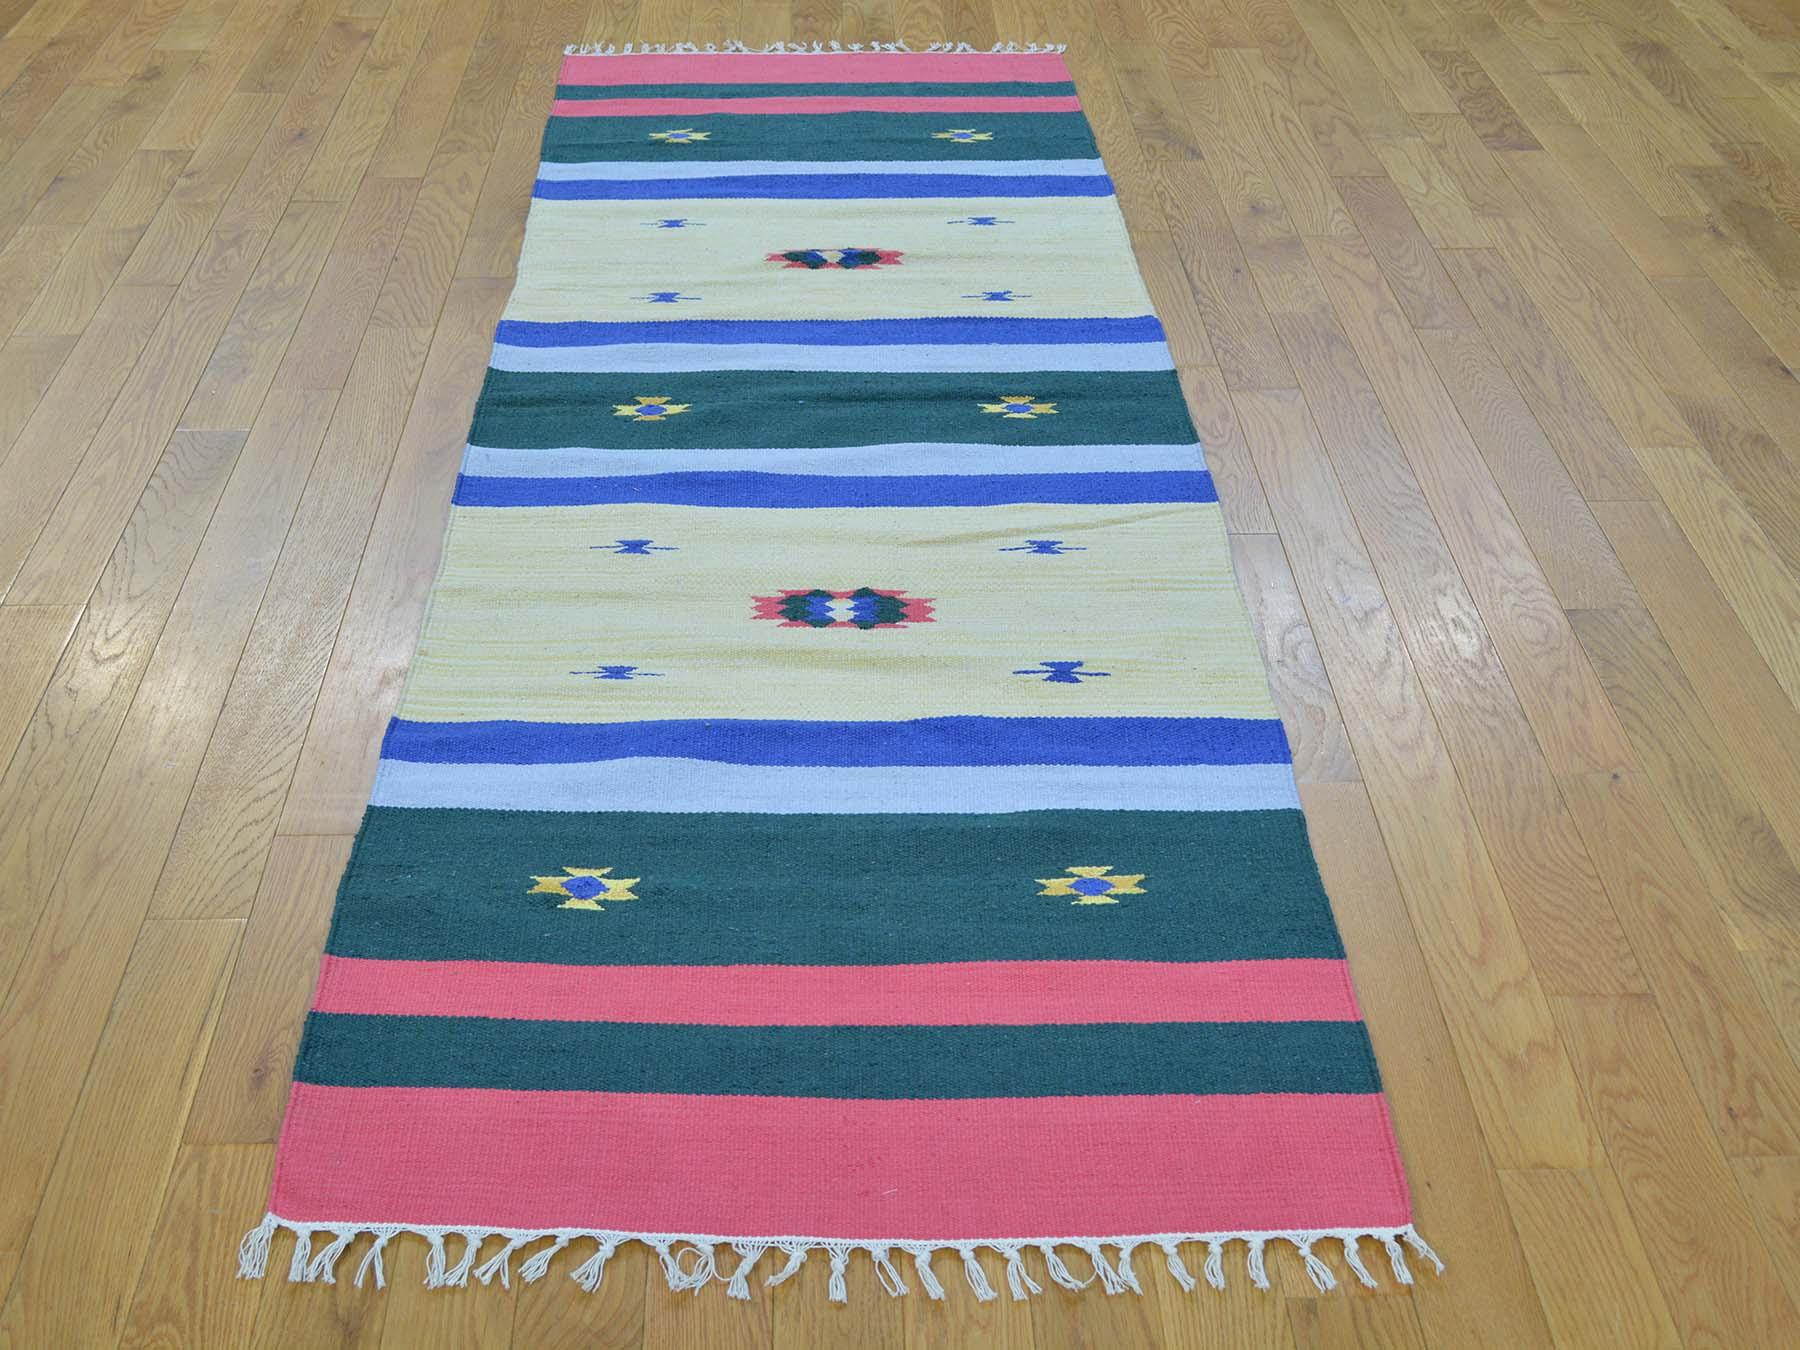 2-6 x7-7  Navajo Design Runner Flat Weave Kilim Hand Woven Oriental Rug